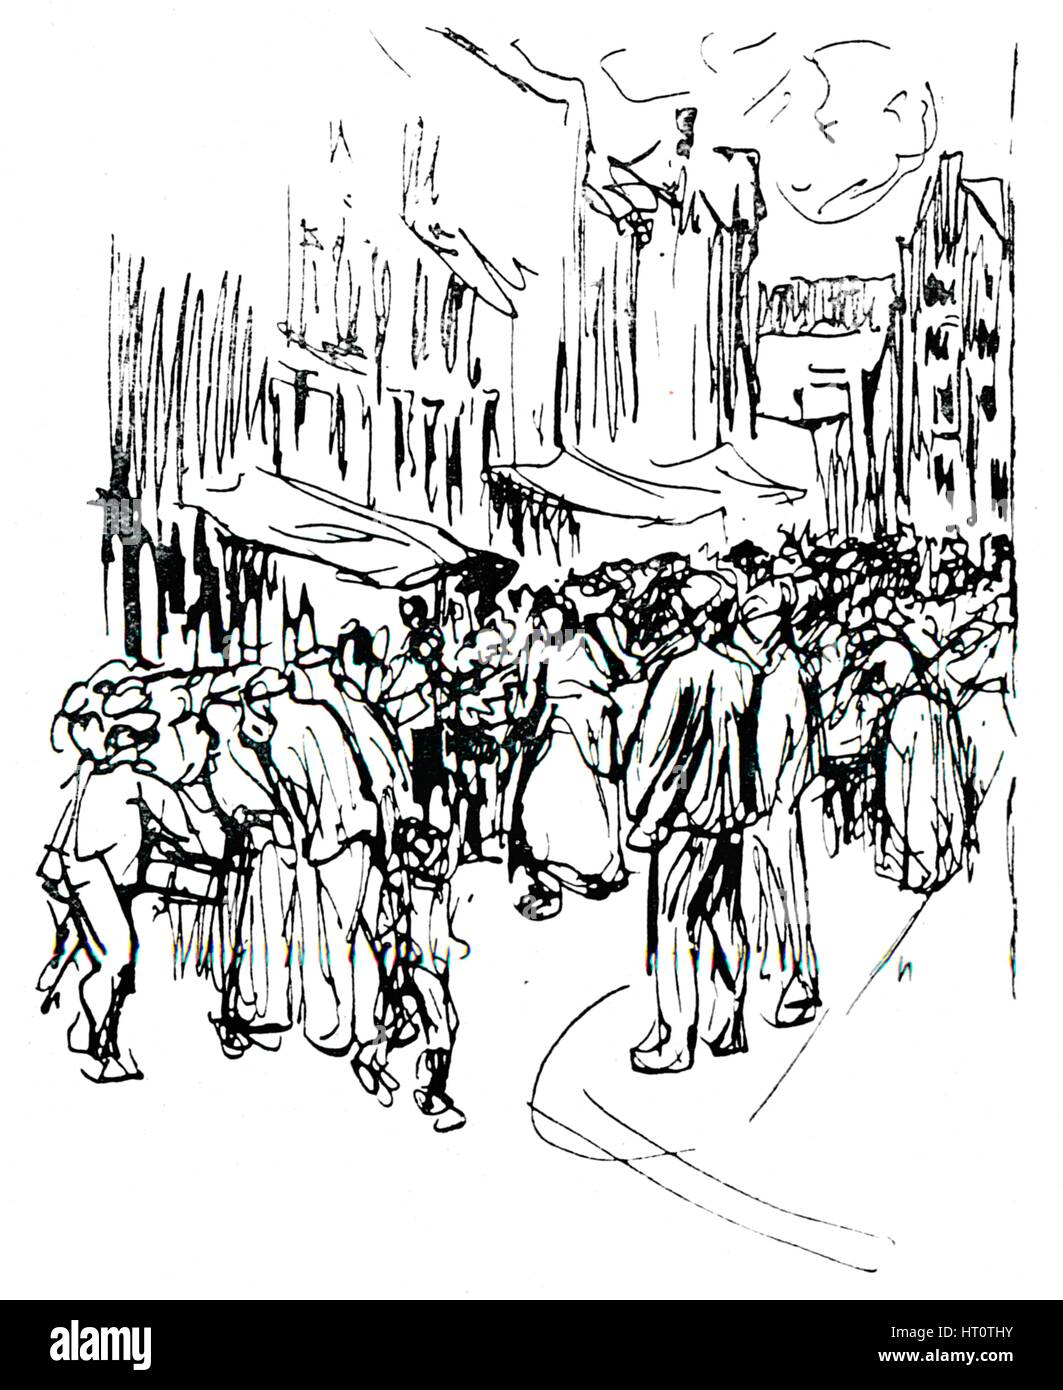 'Pen and ink study', c19th century. Artist: Max Liebermann. - Stock Image